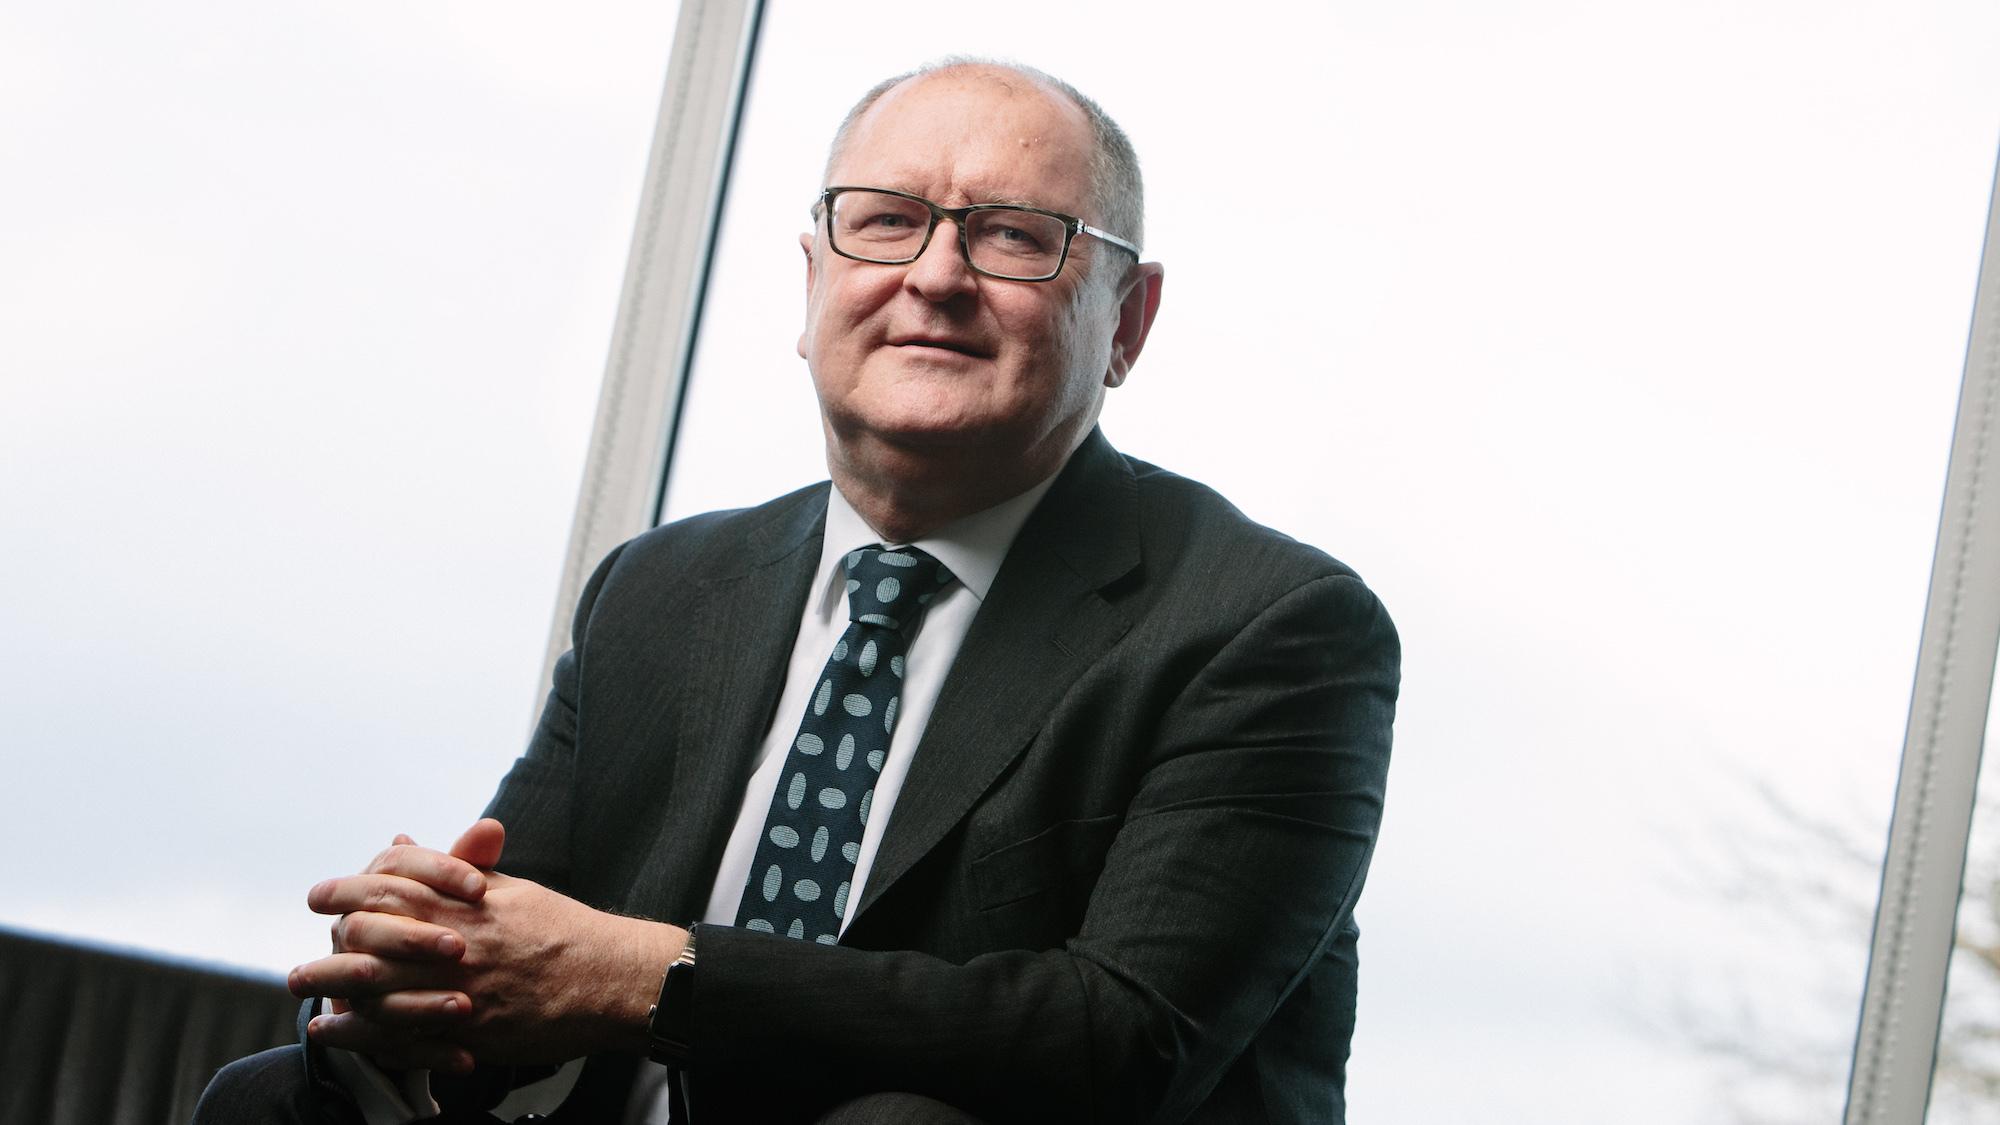 John Mc Donald OPITO chief executive officer preferred press image